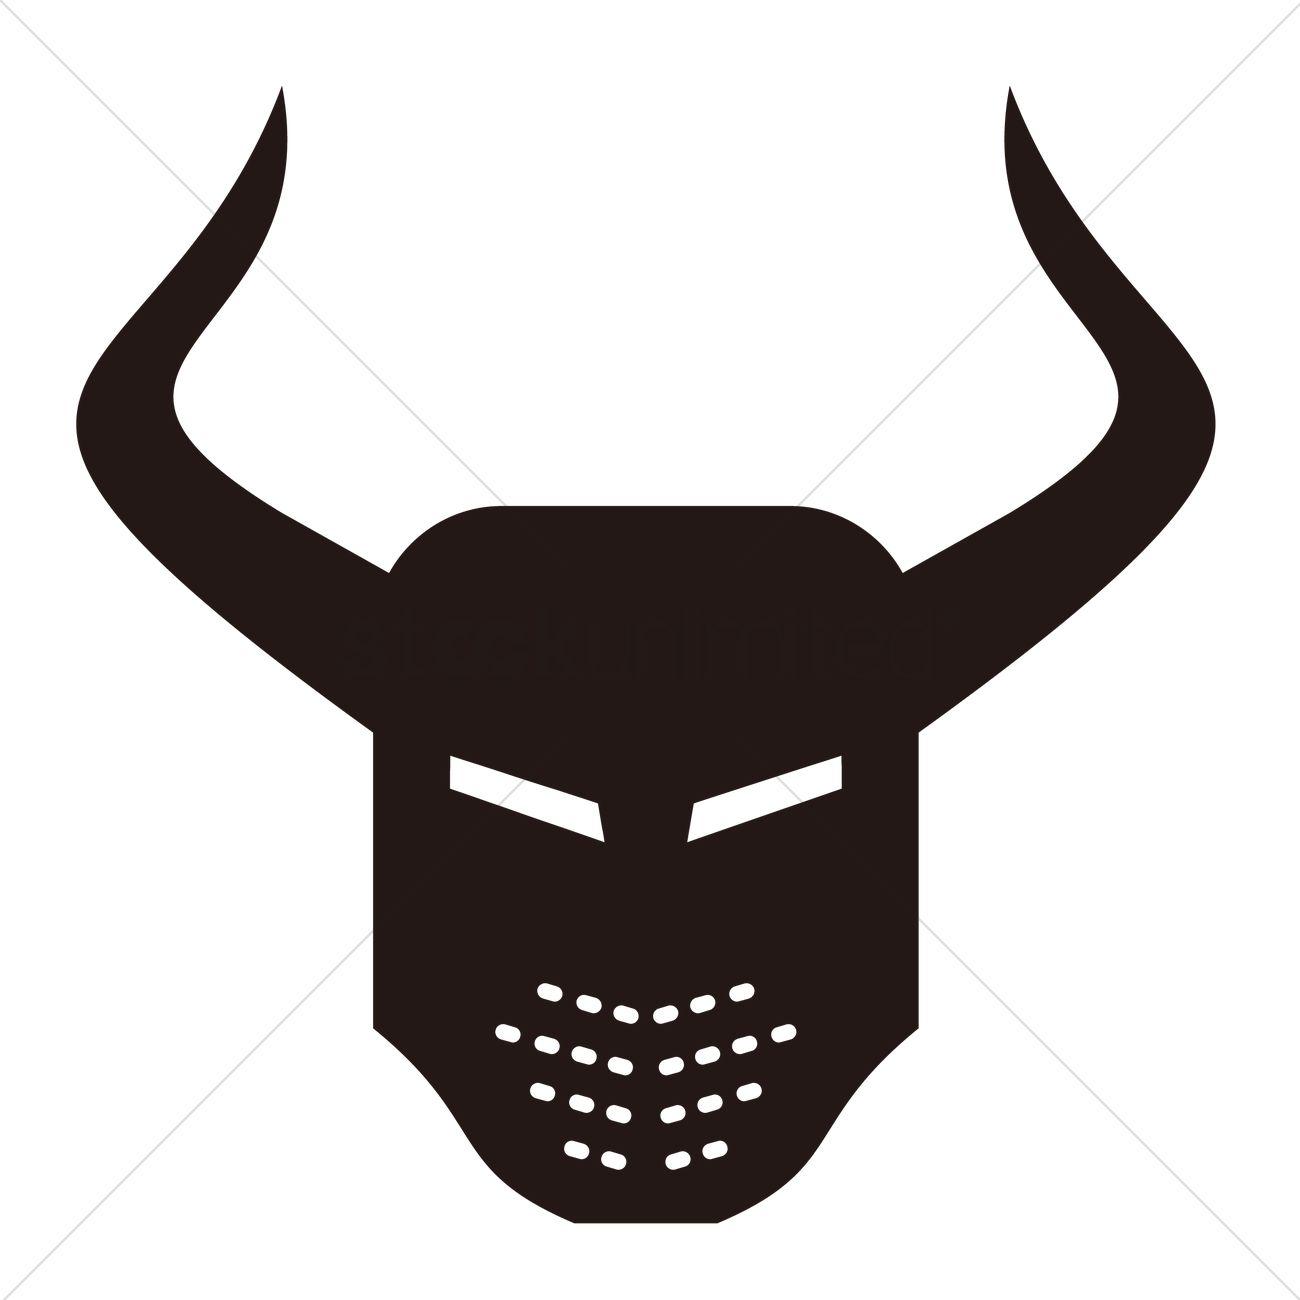 viking helmet vector image 1533352 stockunlimited